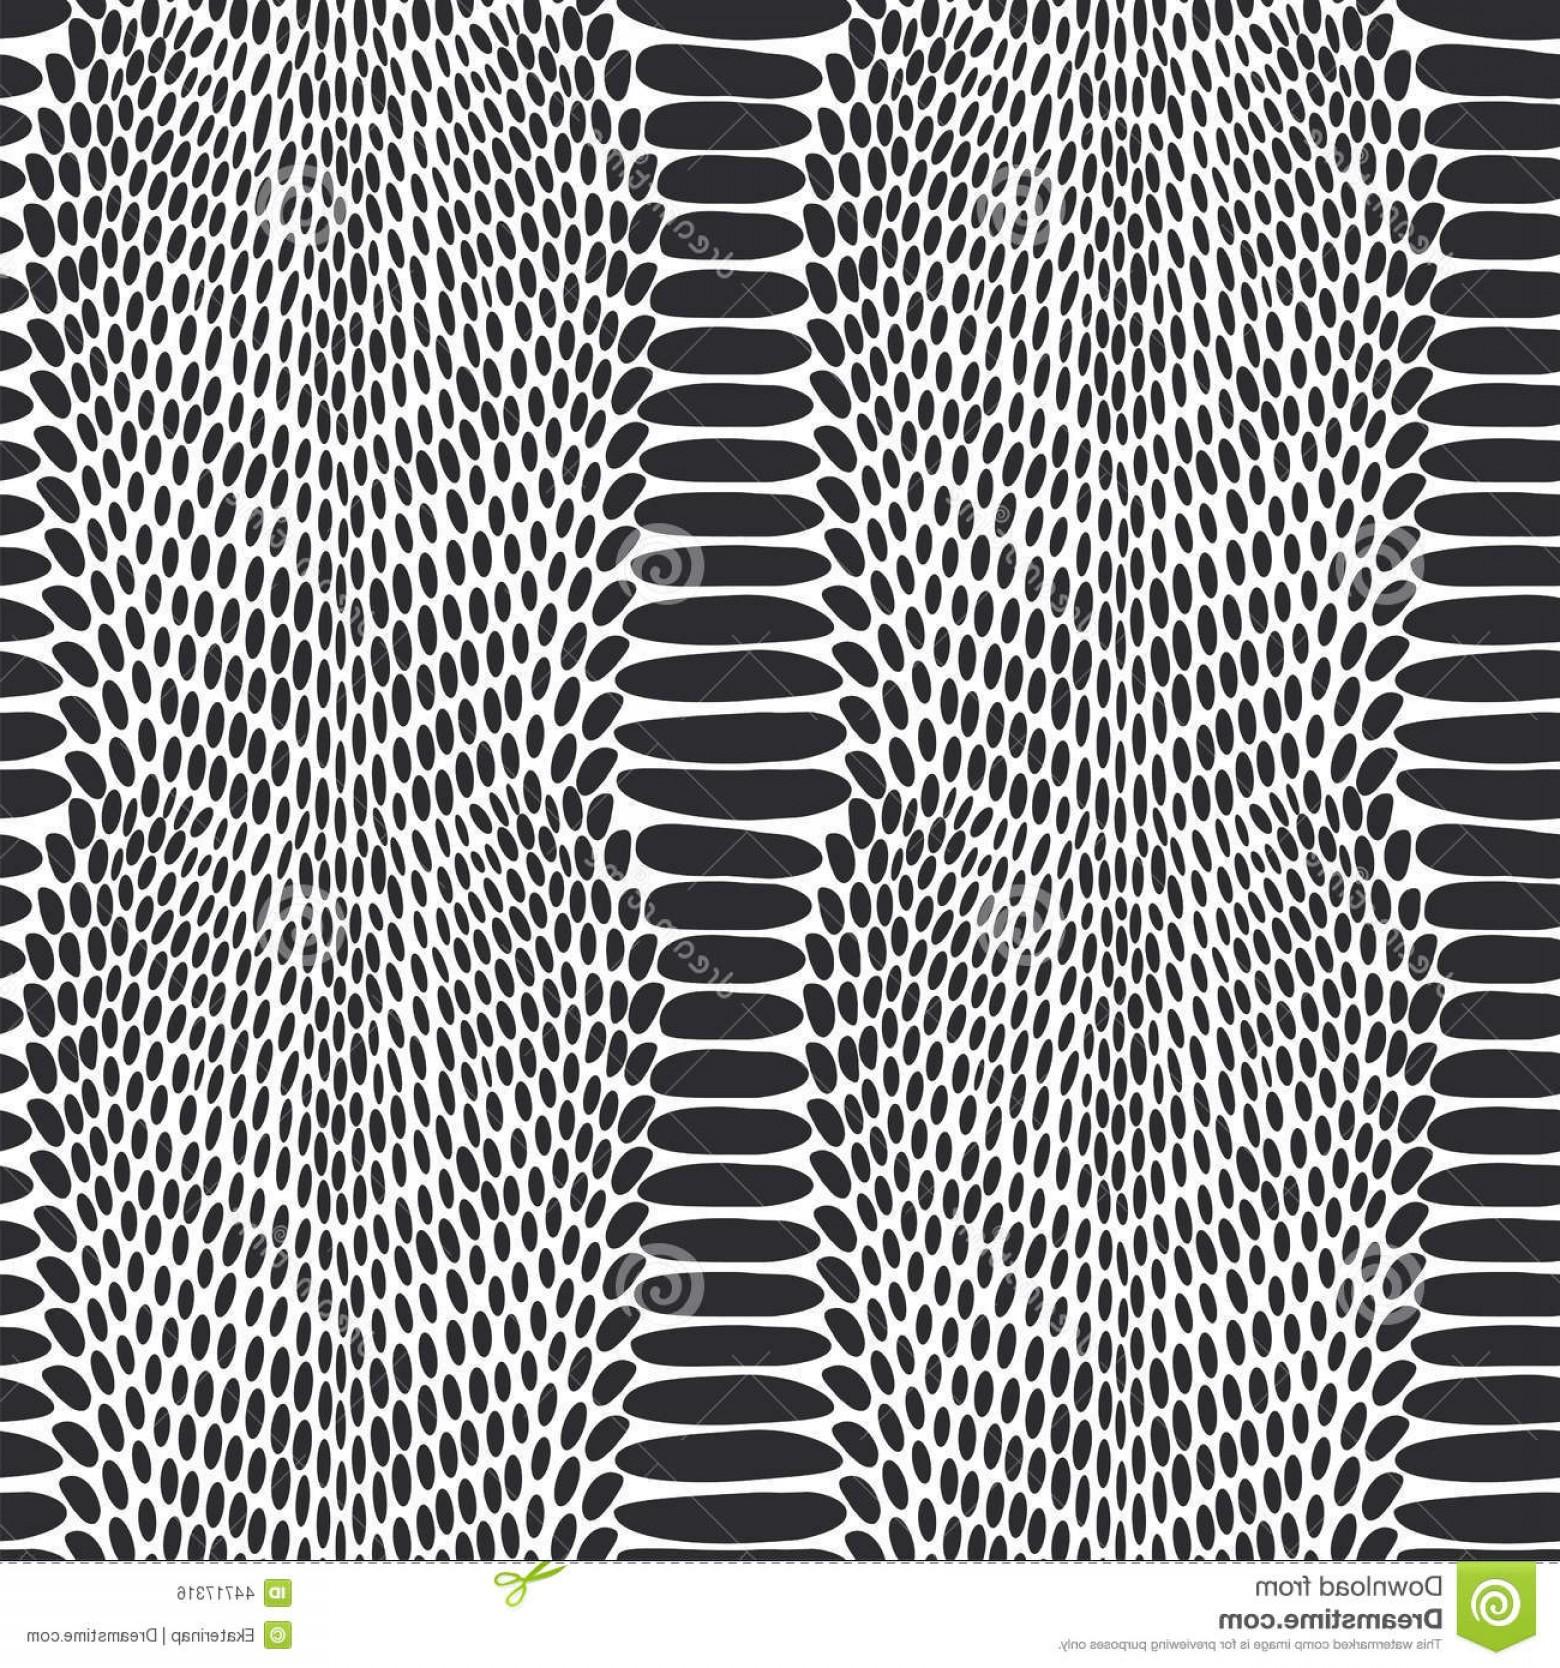 1560x1668 Stock Illustration Snake Skin Texture Seamless Pattern Black White